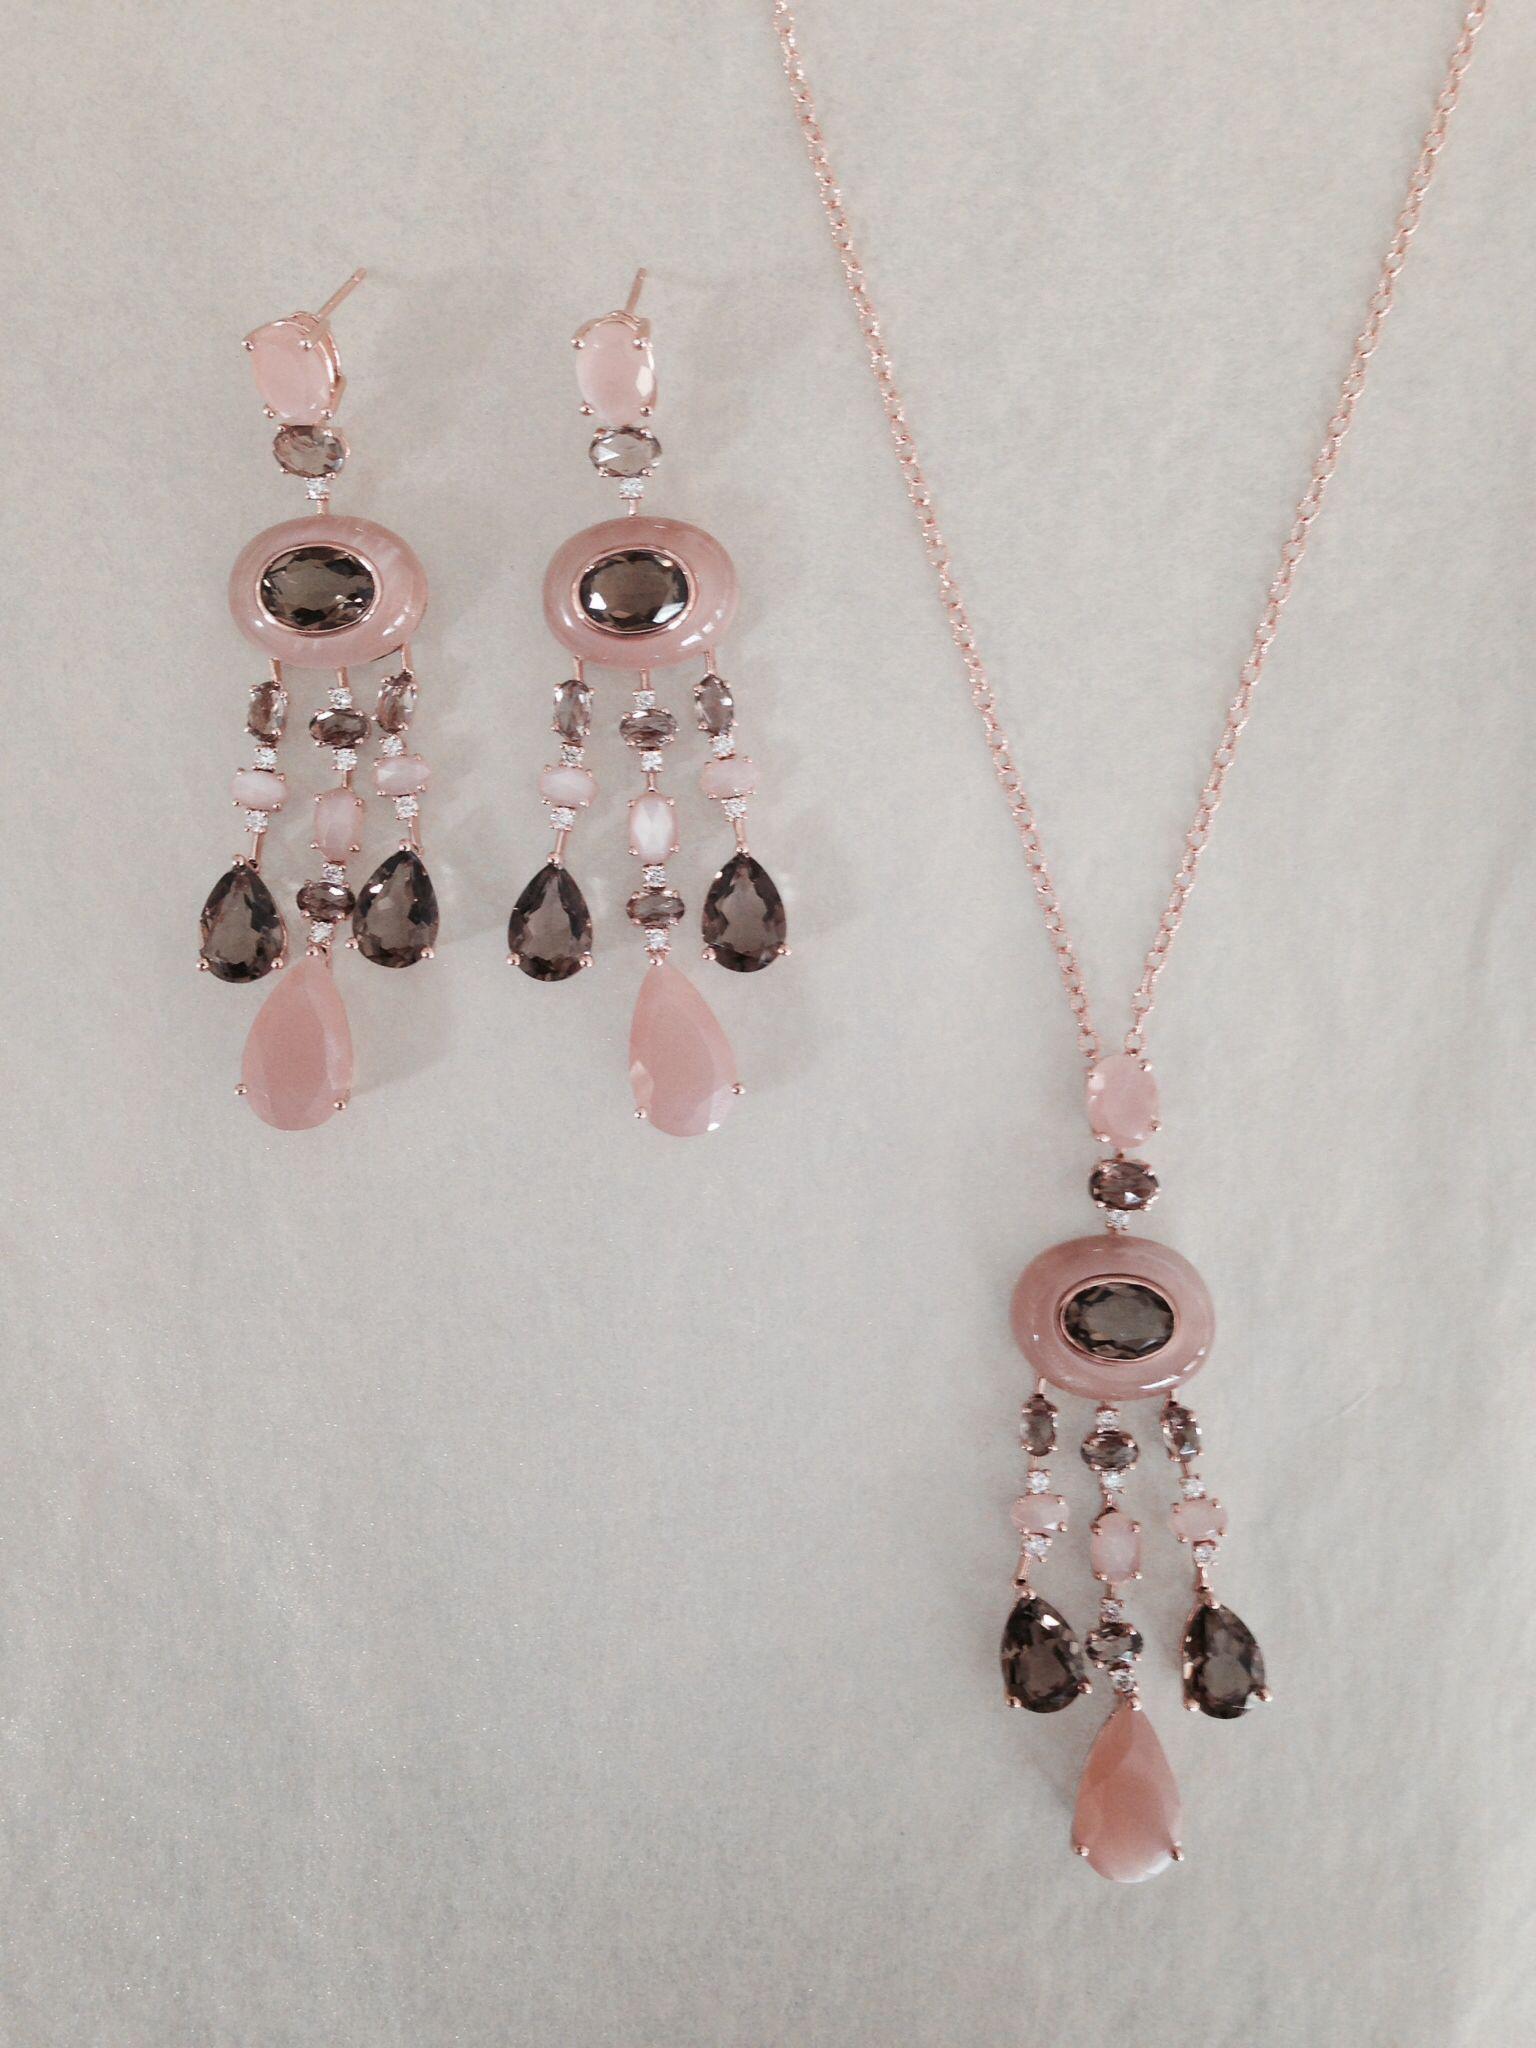 Smoky topaz rose quartz and diamonds are set in k rose gold to